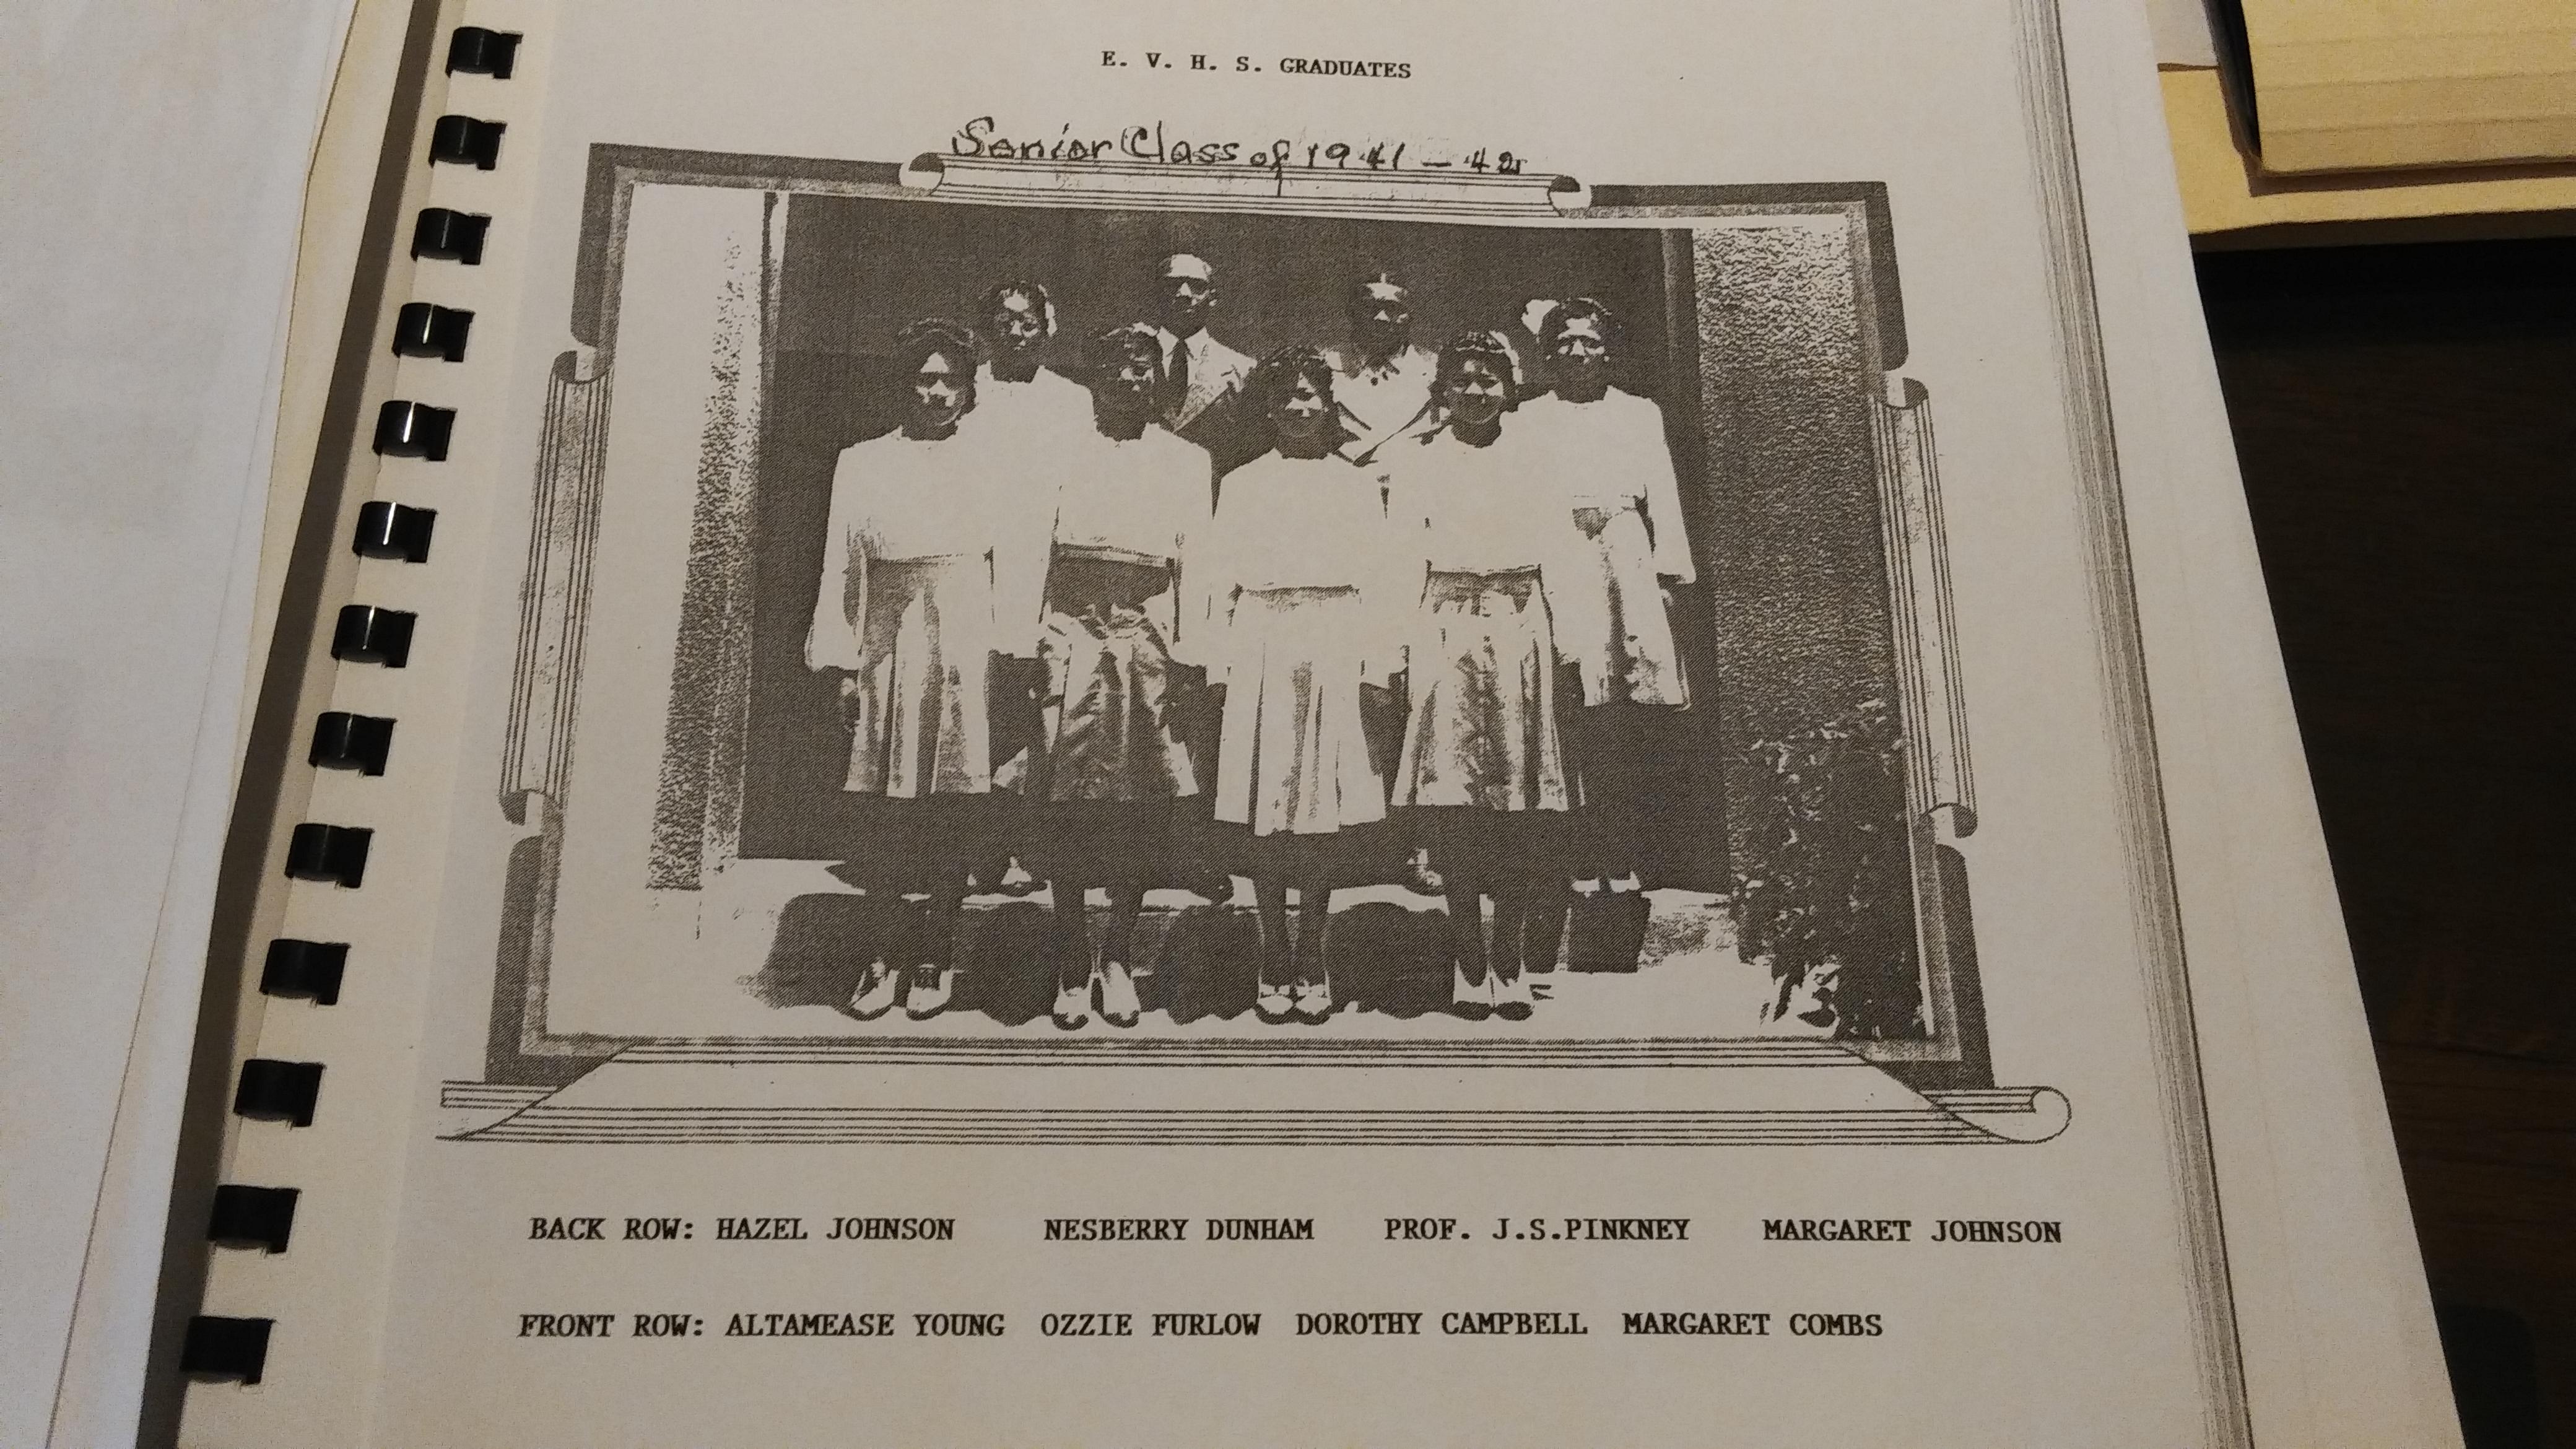 Eustis Vocational High School Senior Class of 1941-1942. Hazel Johnson, Nesberry Dunham, Professor Pinkney, Margaret Johnson, Altamease Young, Ozzie Furlow, Dorothy Campbell, Margaret Combs